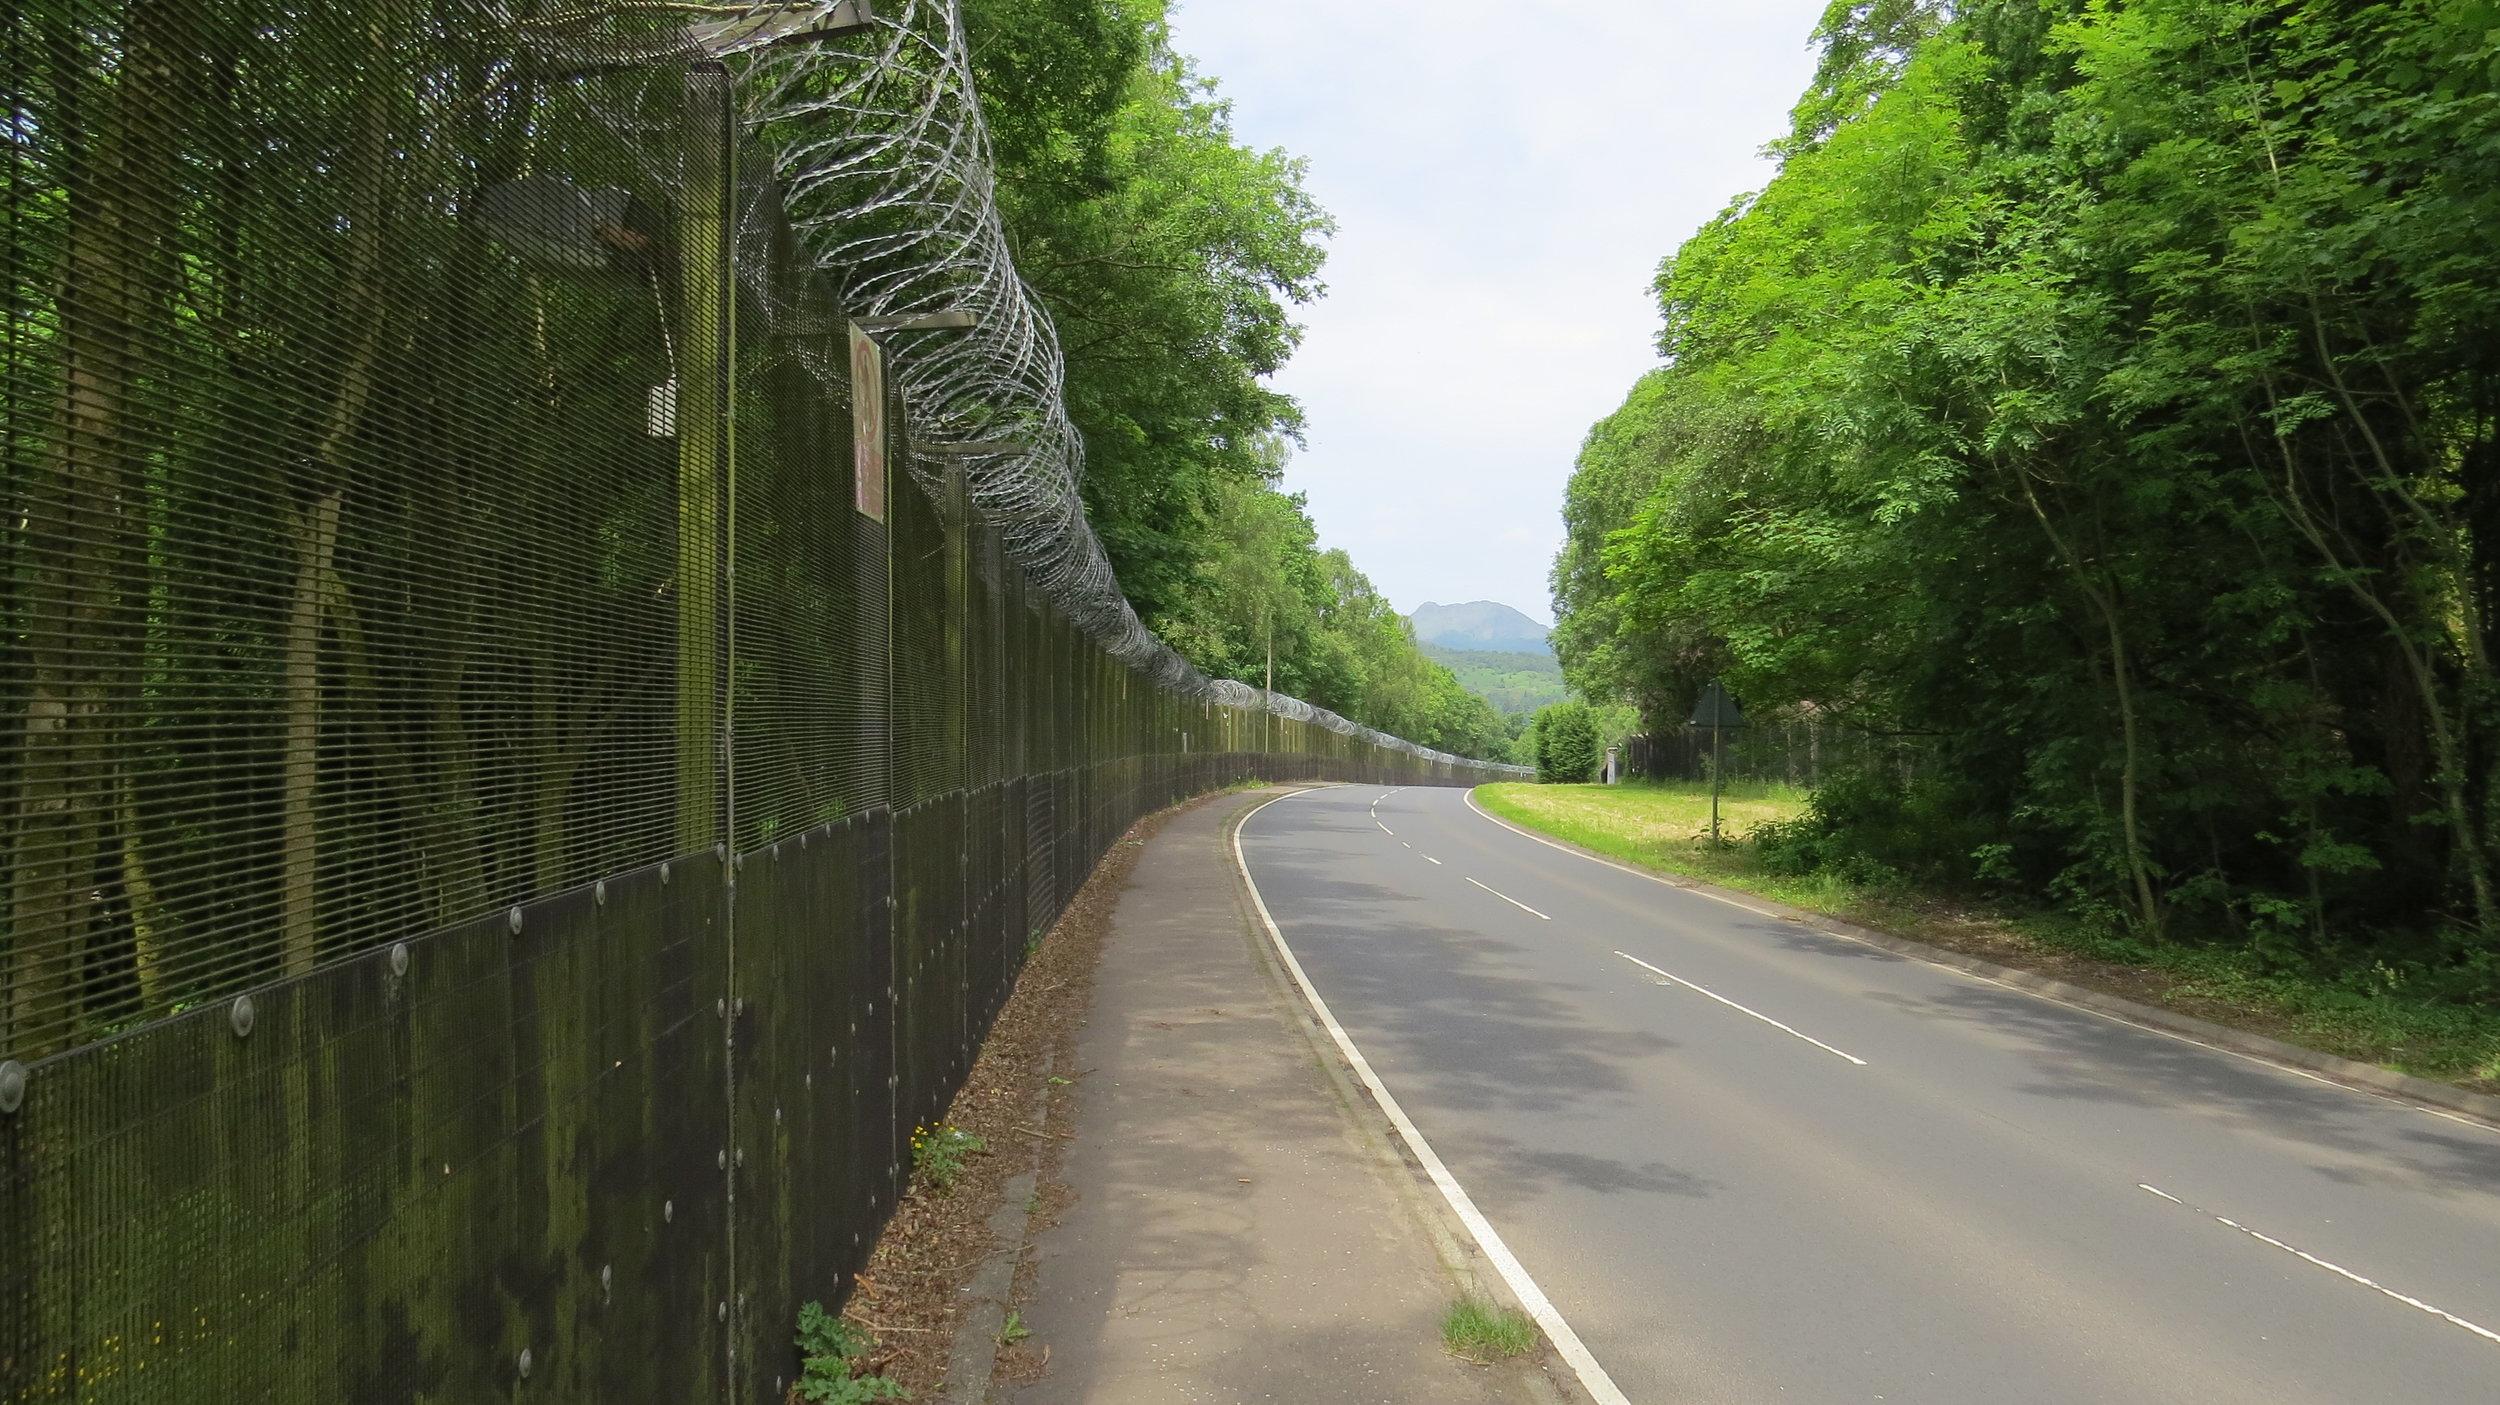 Skirting the Military Base